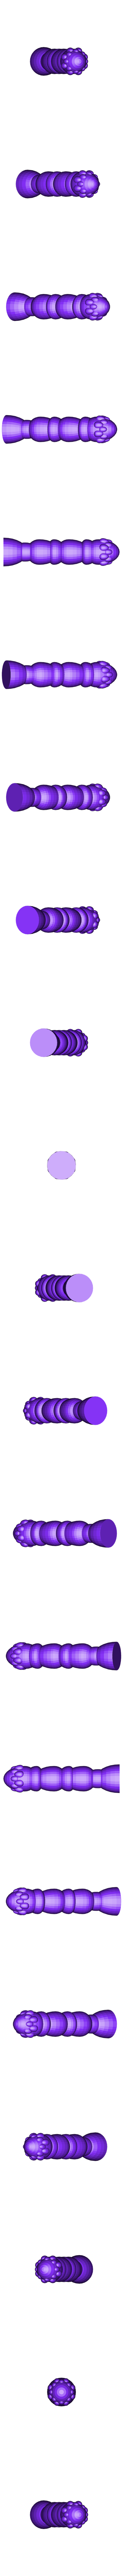 totem.stl Download STL file Pleasure stick • 3D printing design, cokinou